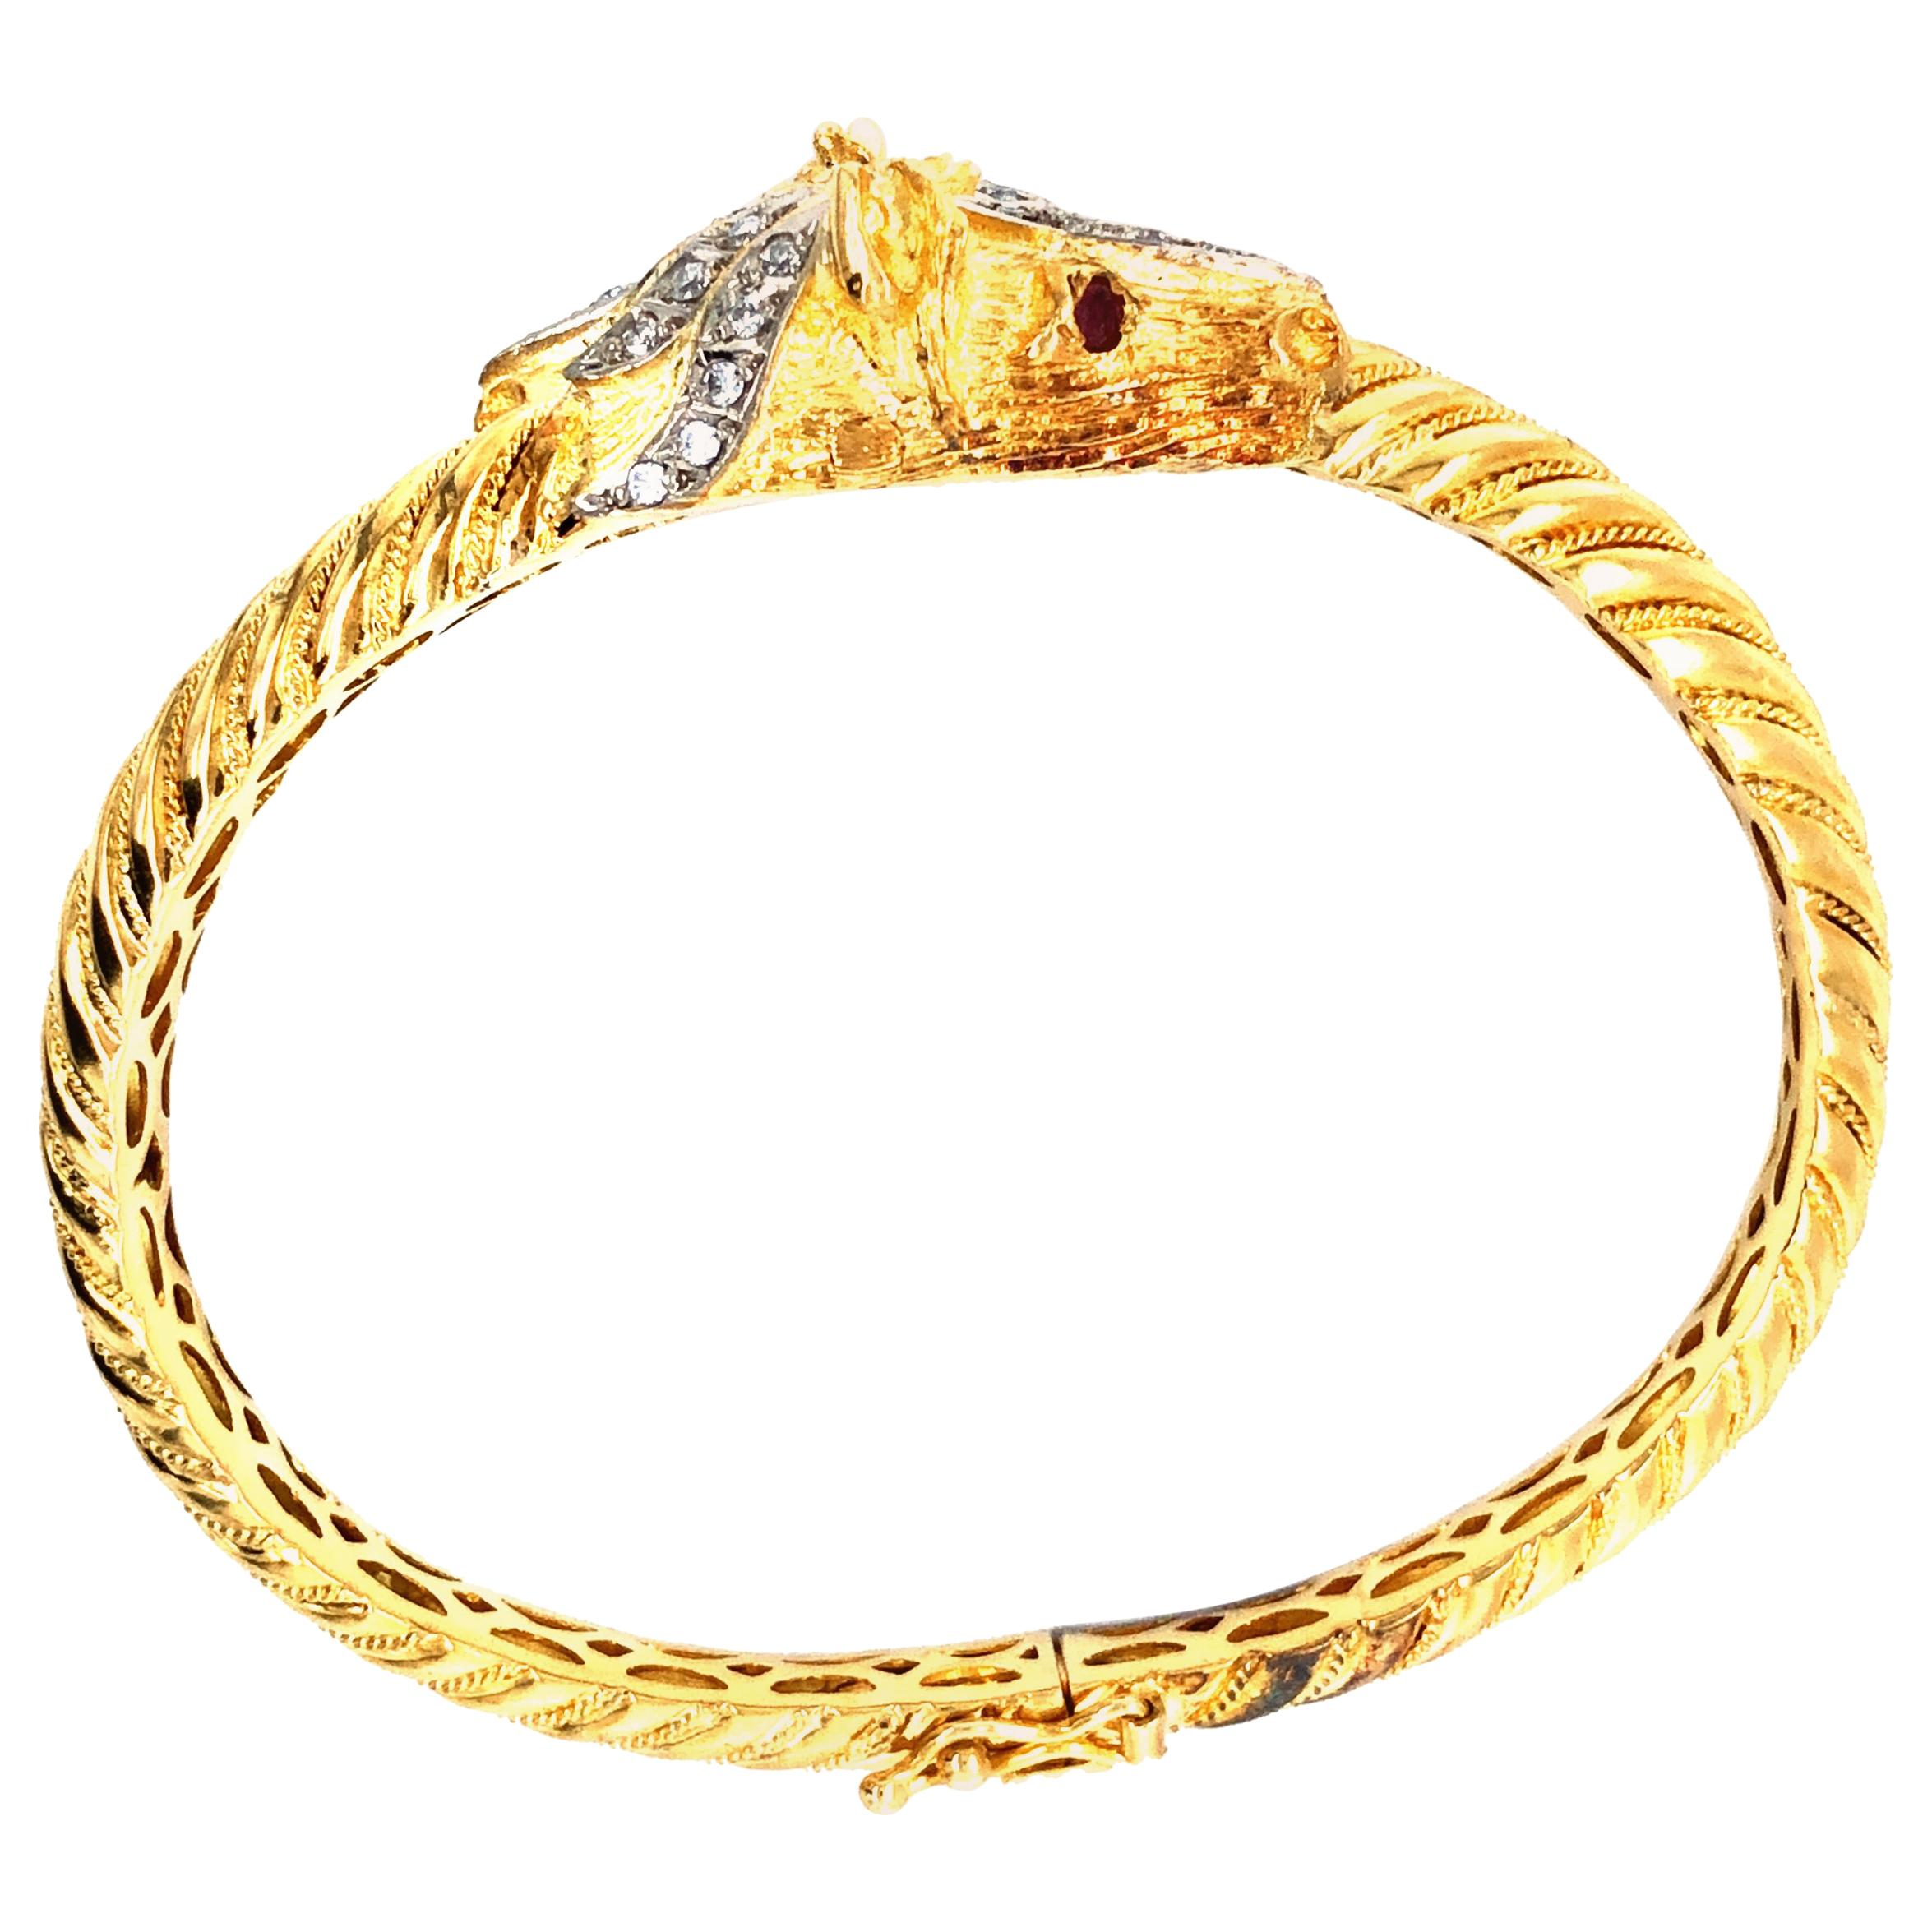 Horses Head 18 Karat Yellow Gold Bangle with Diamonds, Rubies, circa 1970